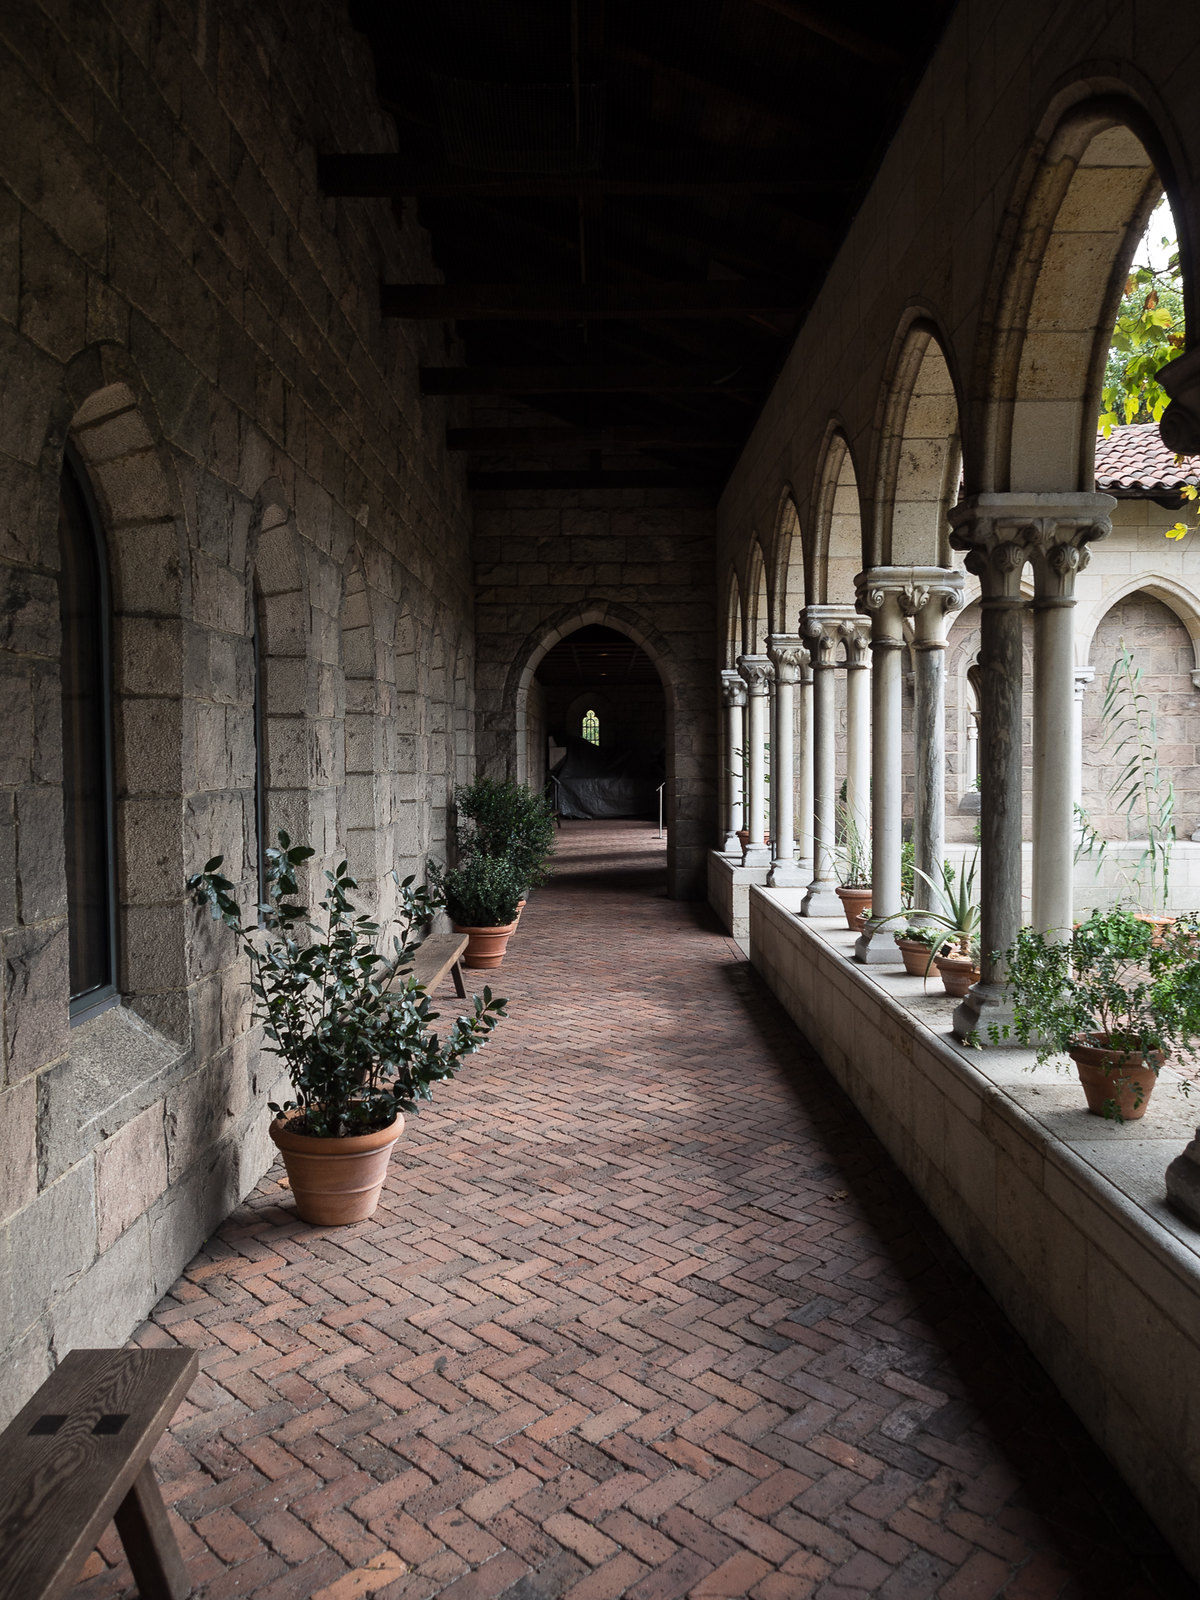 Cloisters Museum & Gardens